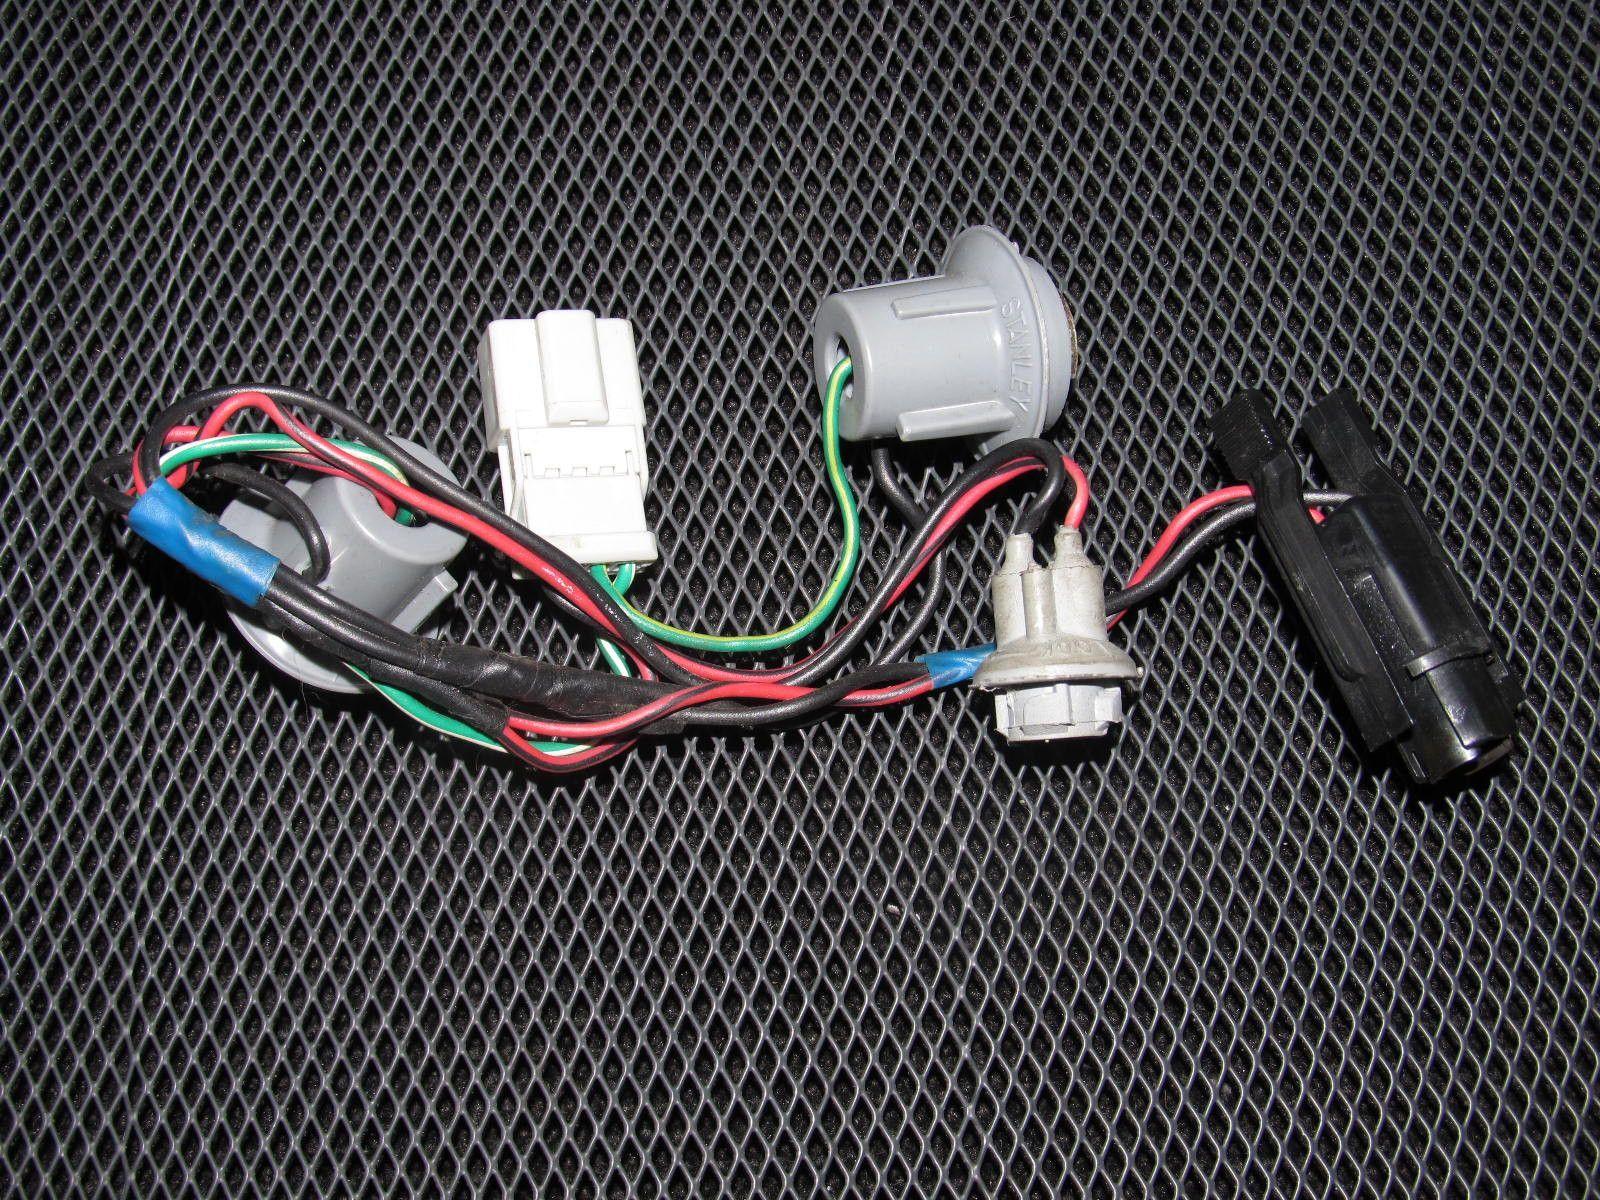 hight resolution of 88 91 honda crx oem tail light bulb socket harness